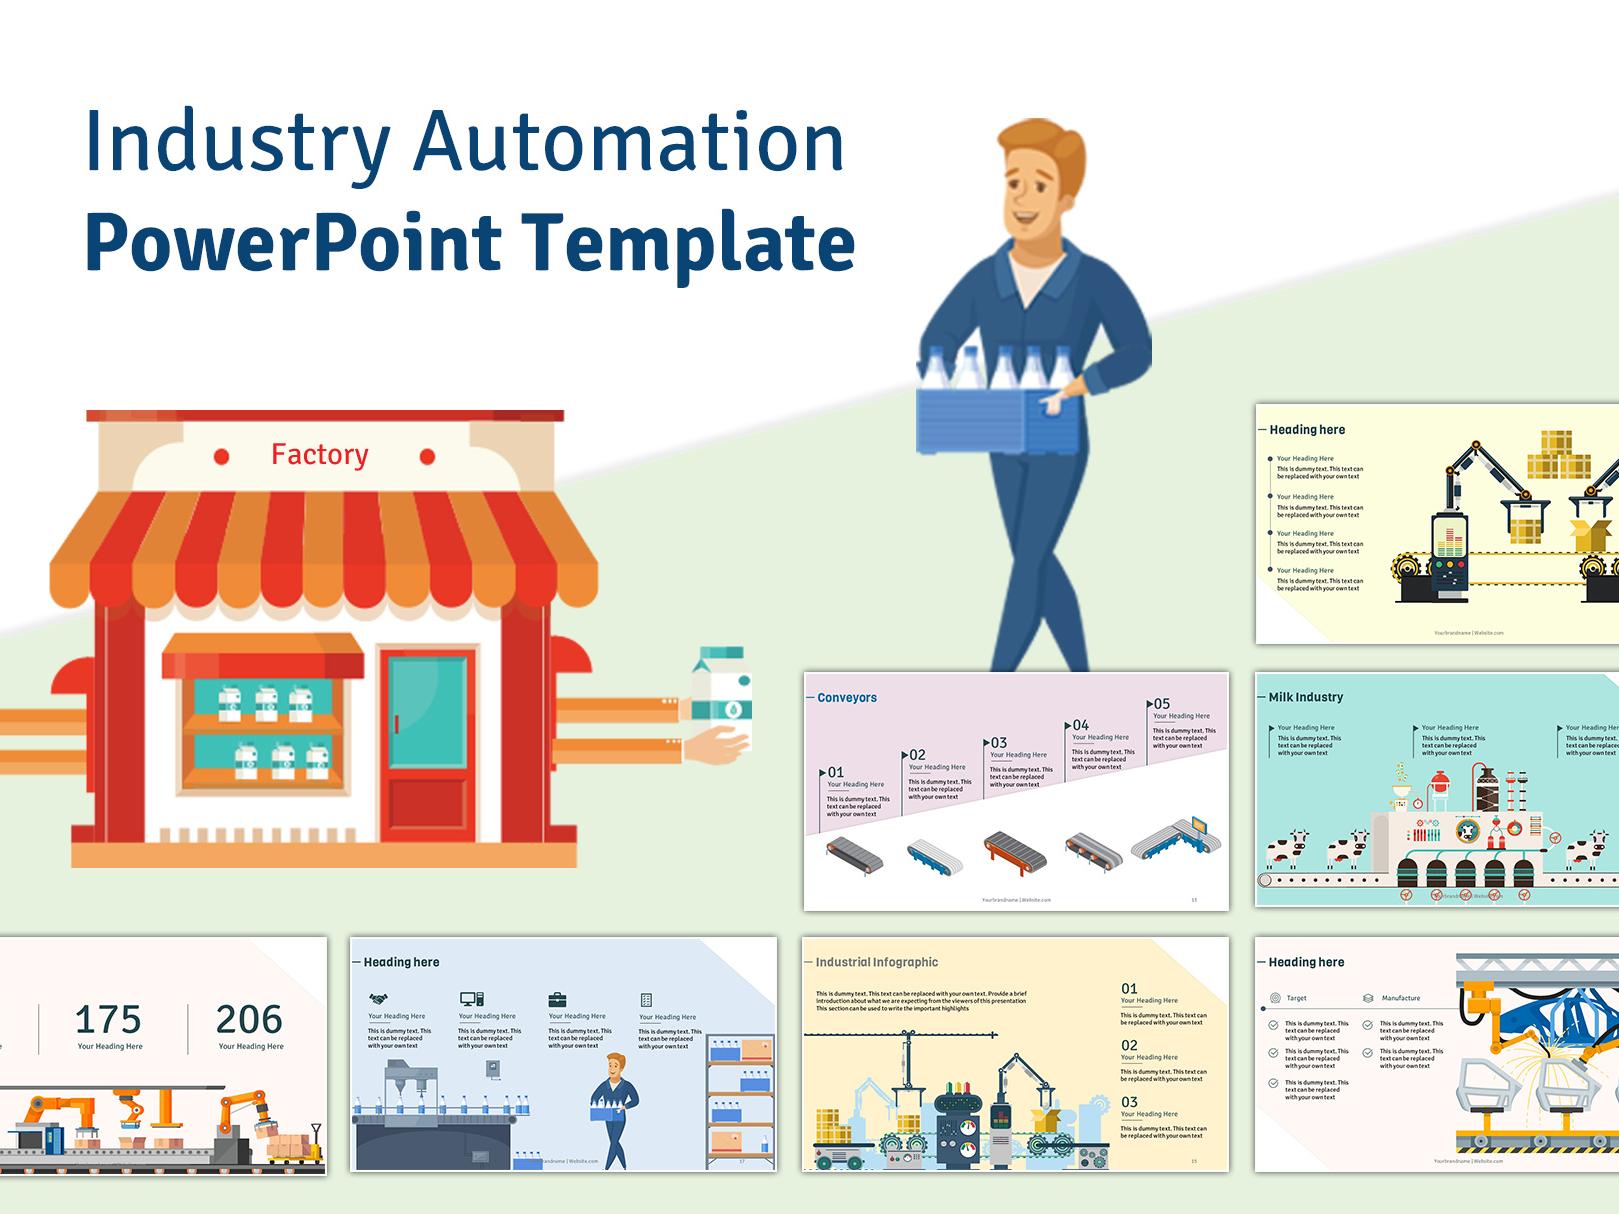 1820x1214 industryautomation